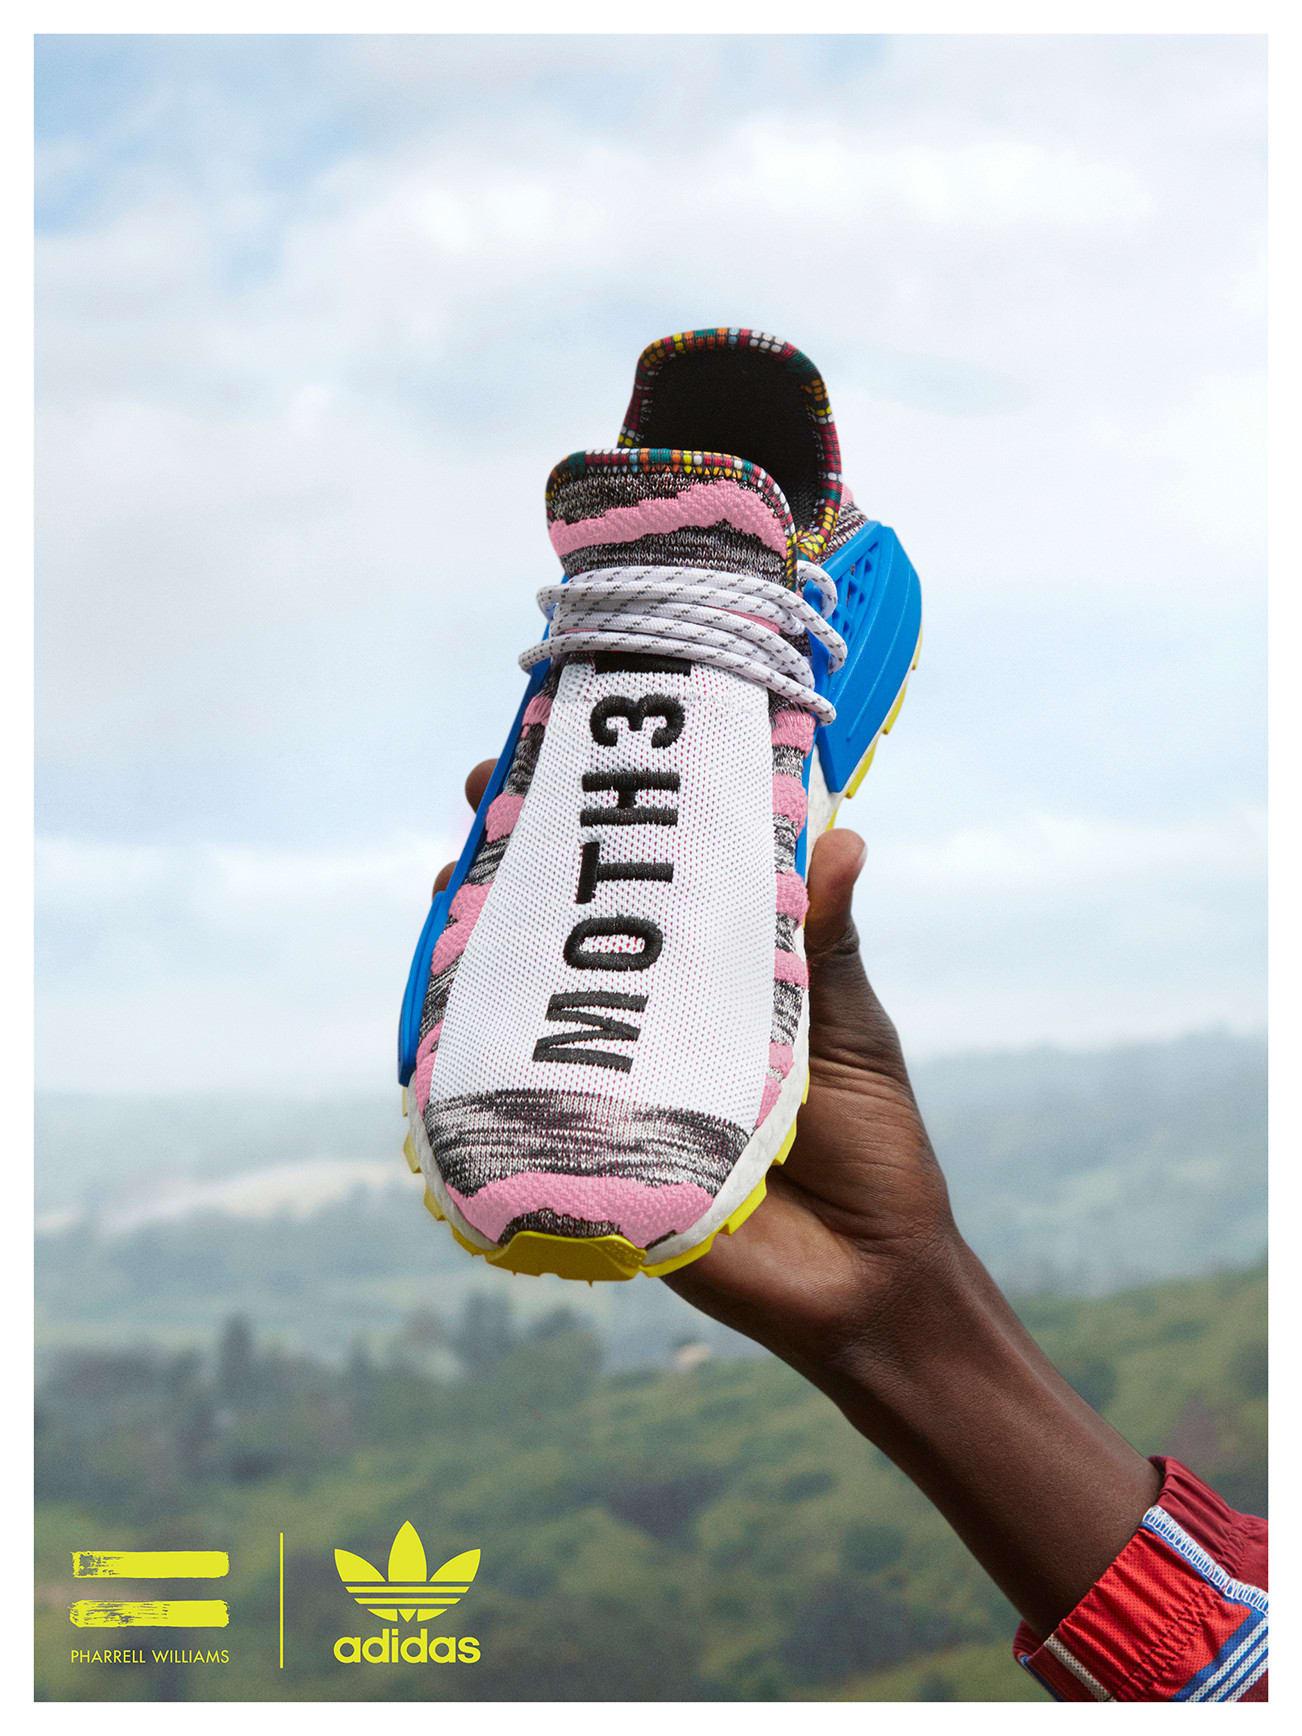 295aa710e Pharrell Williams x adidas Solar HU NMD  Afro Pack - Sneaker Myth